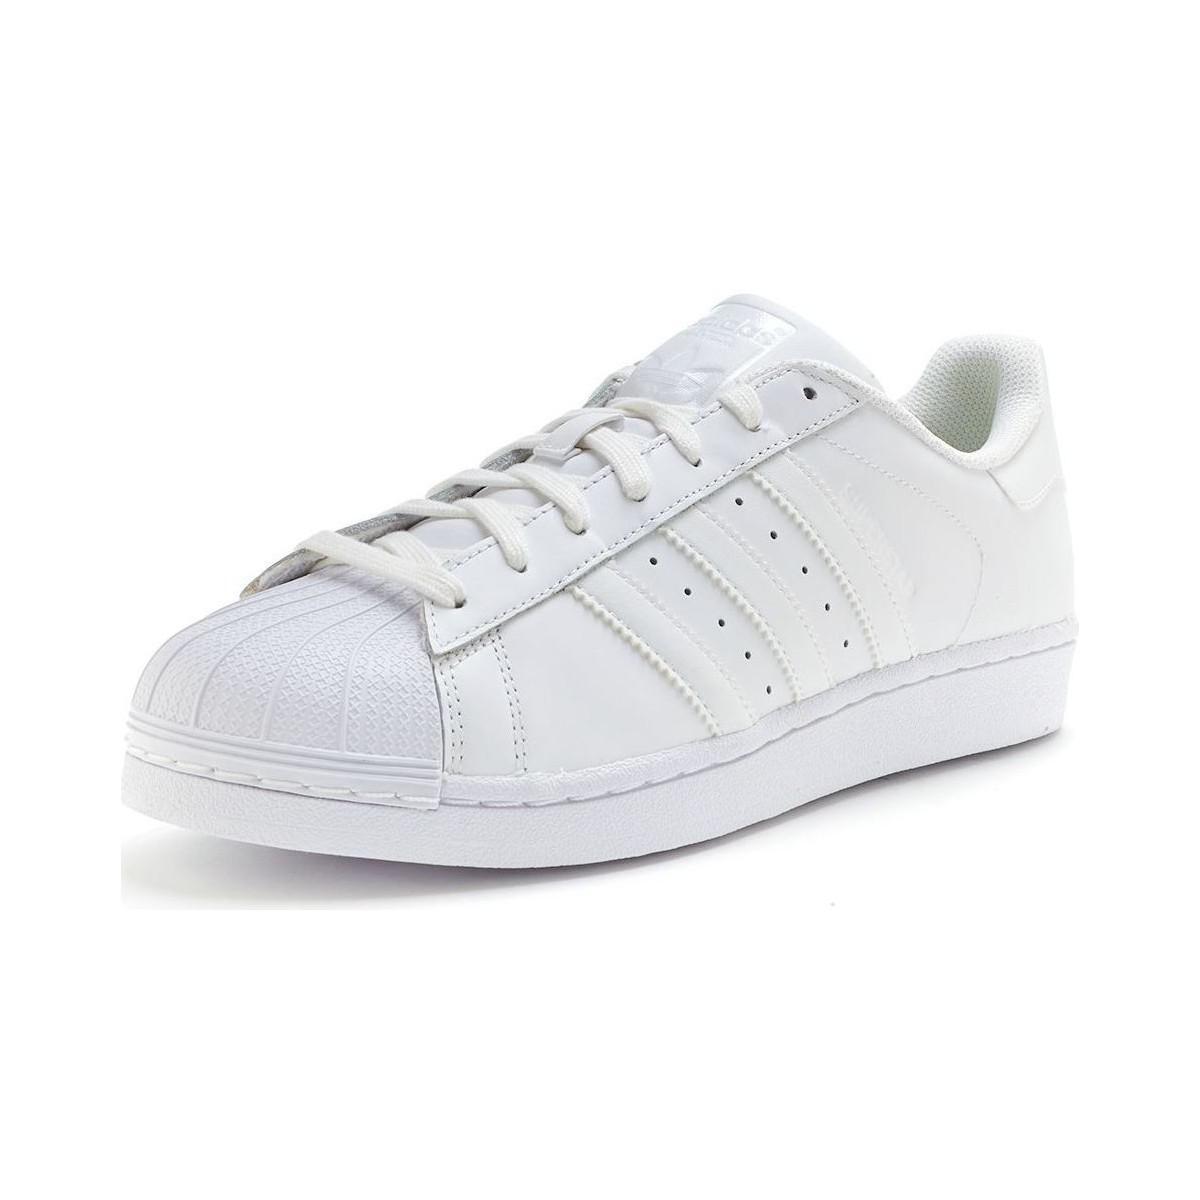 71cc6de4fe09 Adidas - Originals Superstar Trainers In Core White B27136 Men s Shoes ( trainers) In White. View fullscreen